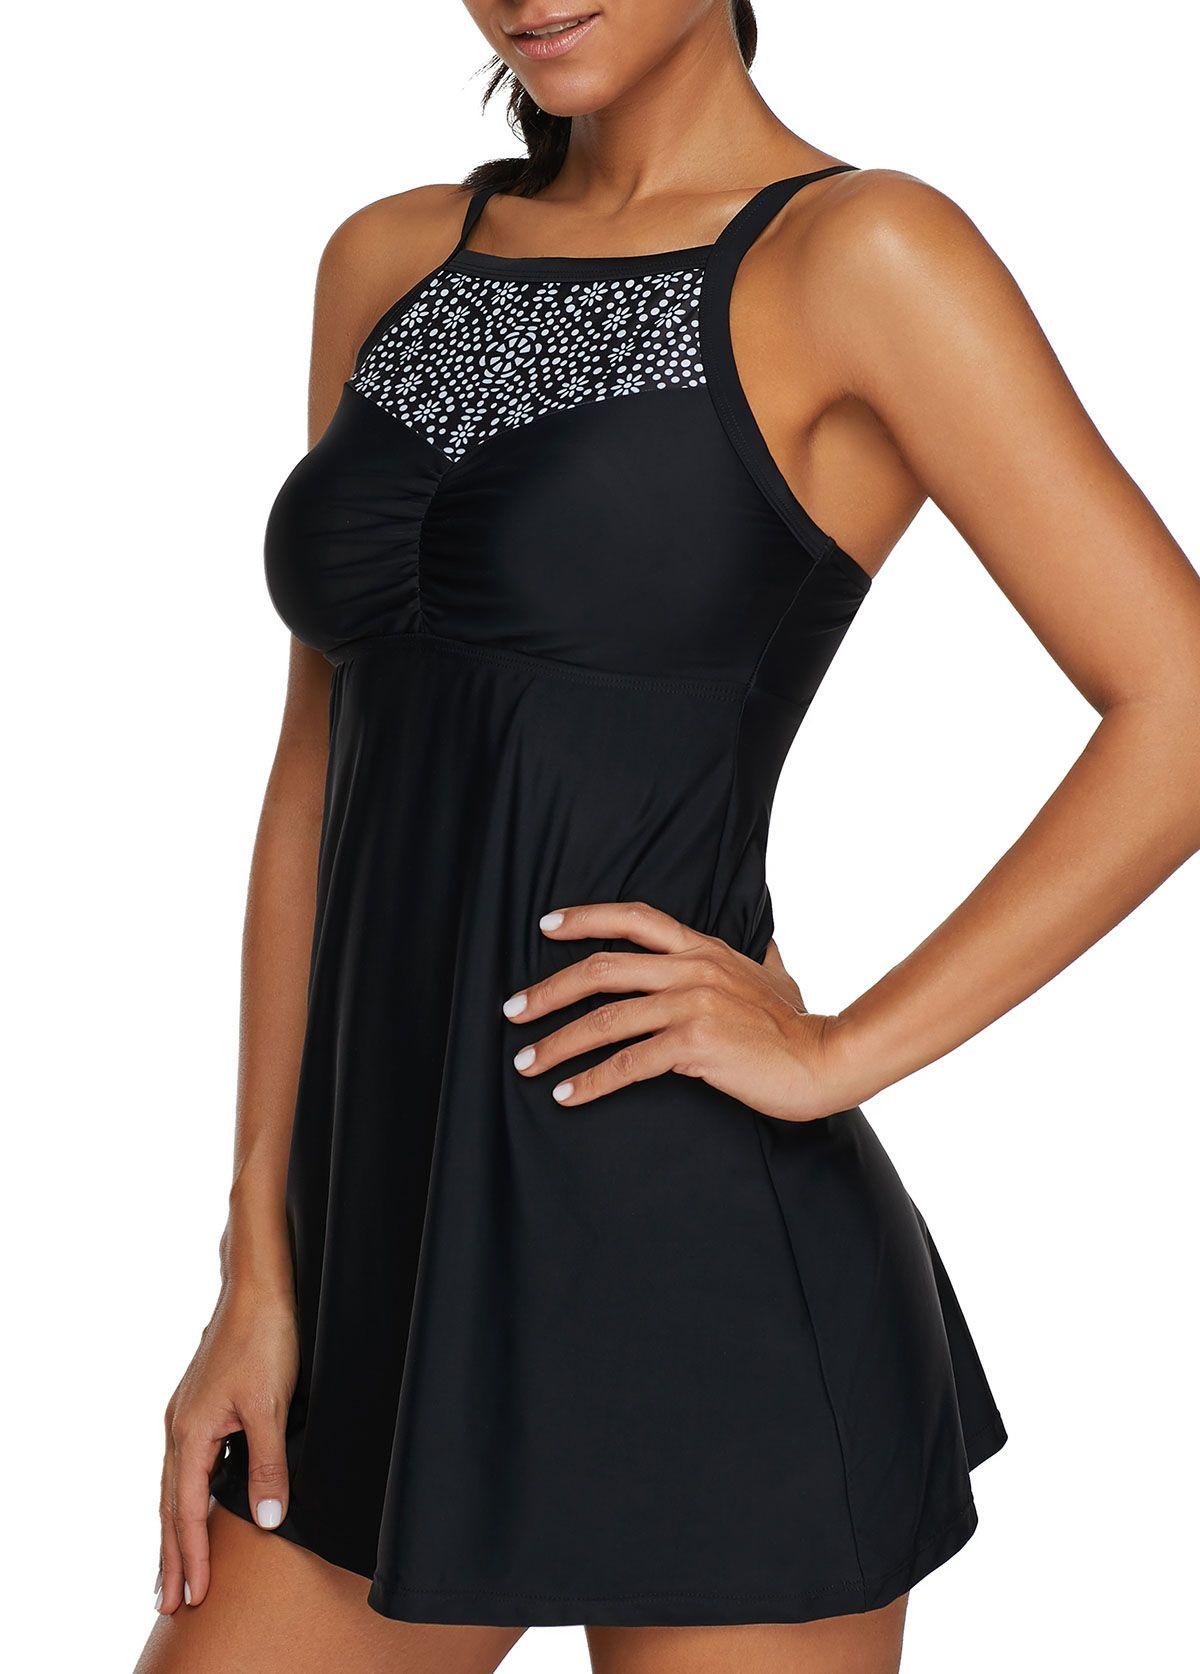 b281ba0d4b Printed Black Padded Open Back Swimdress and Shorts | liligal.com - USD  $26.35